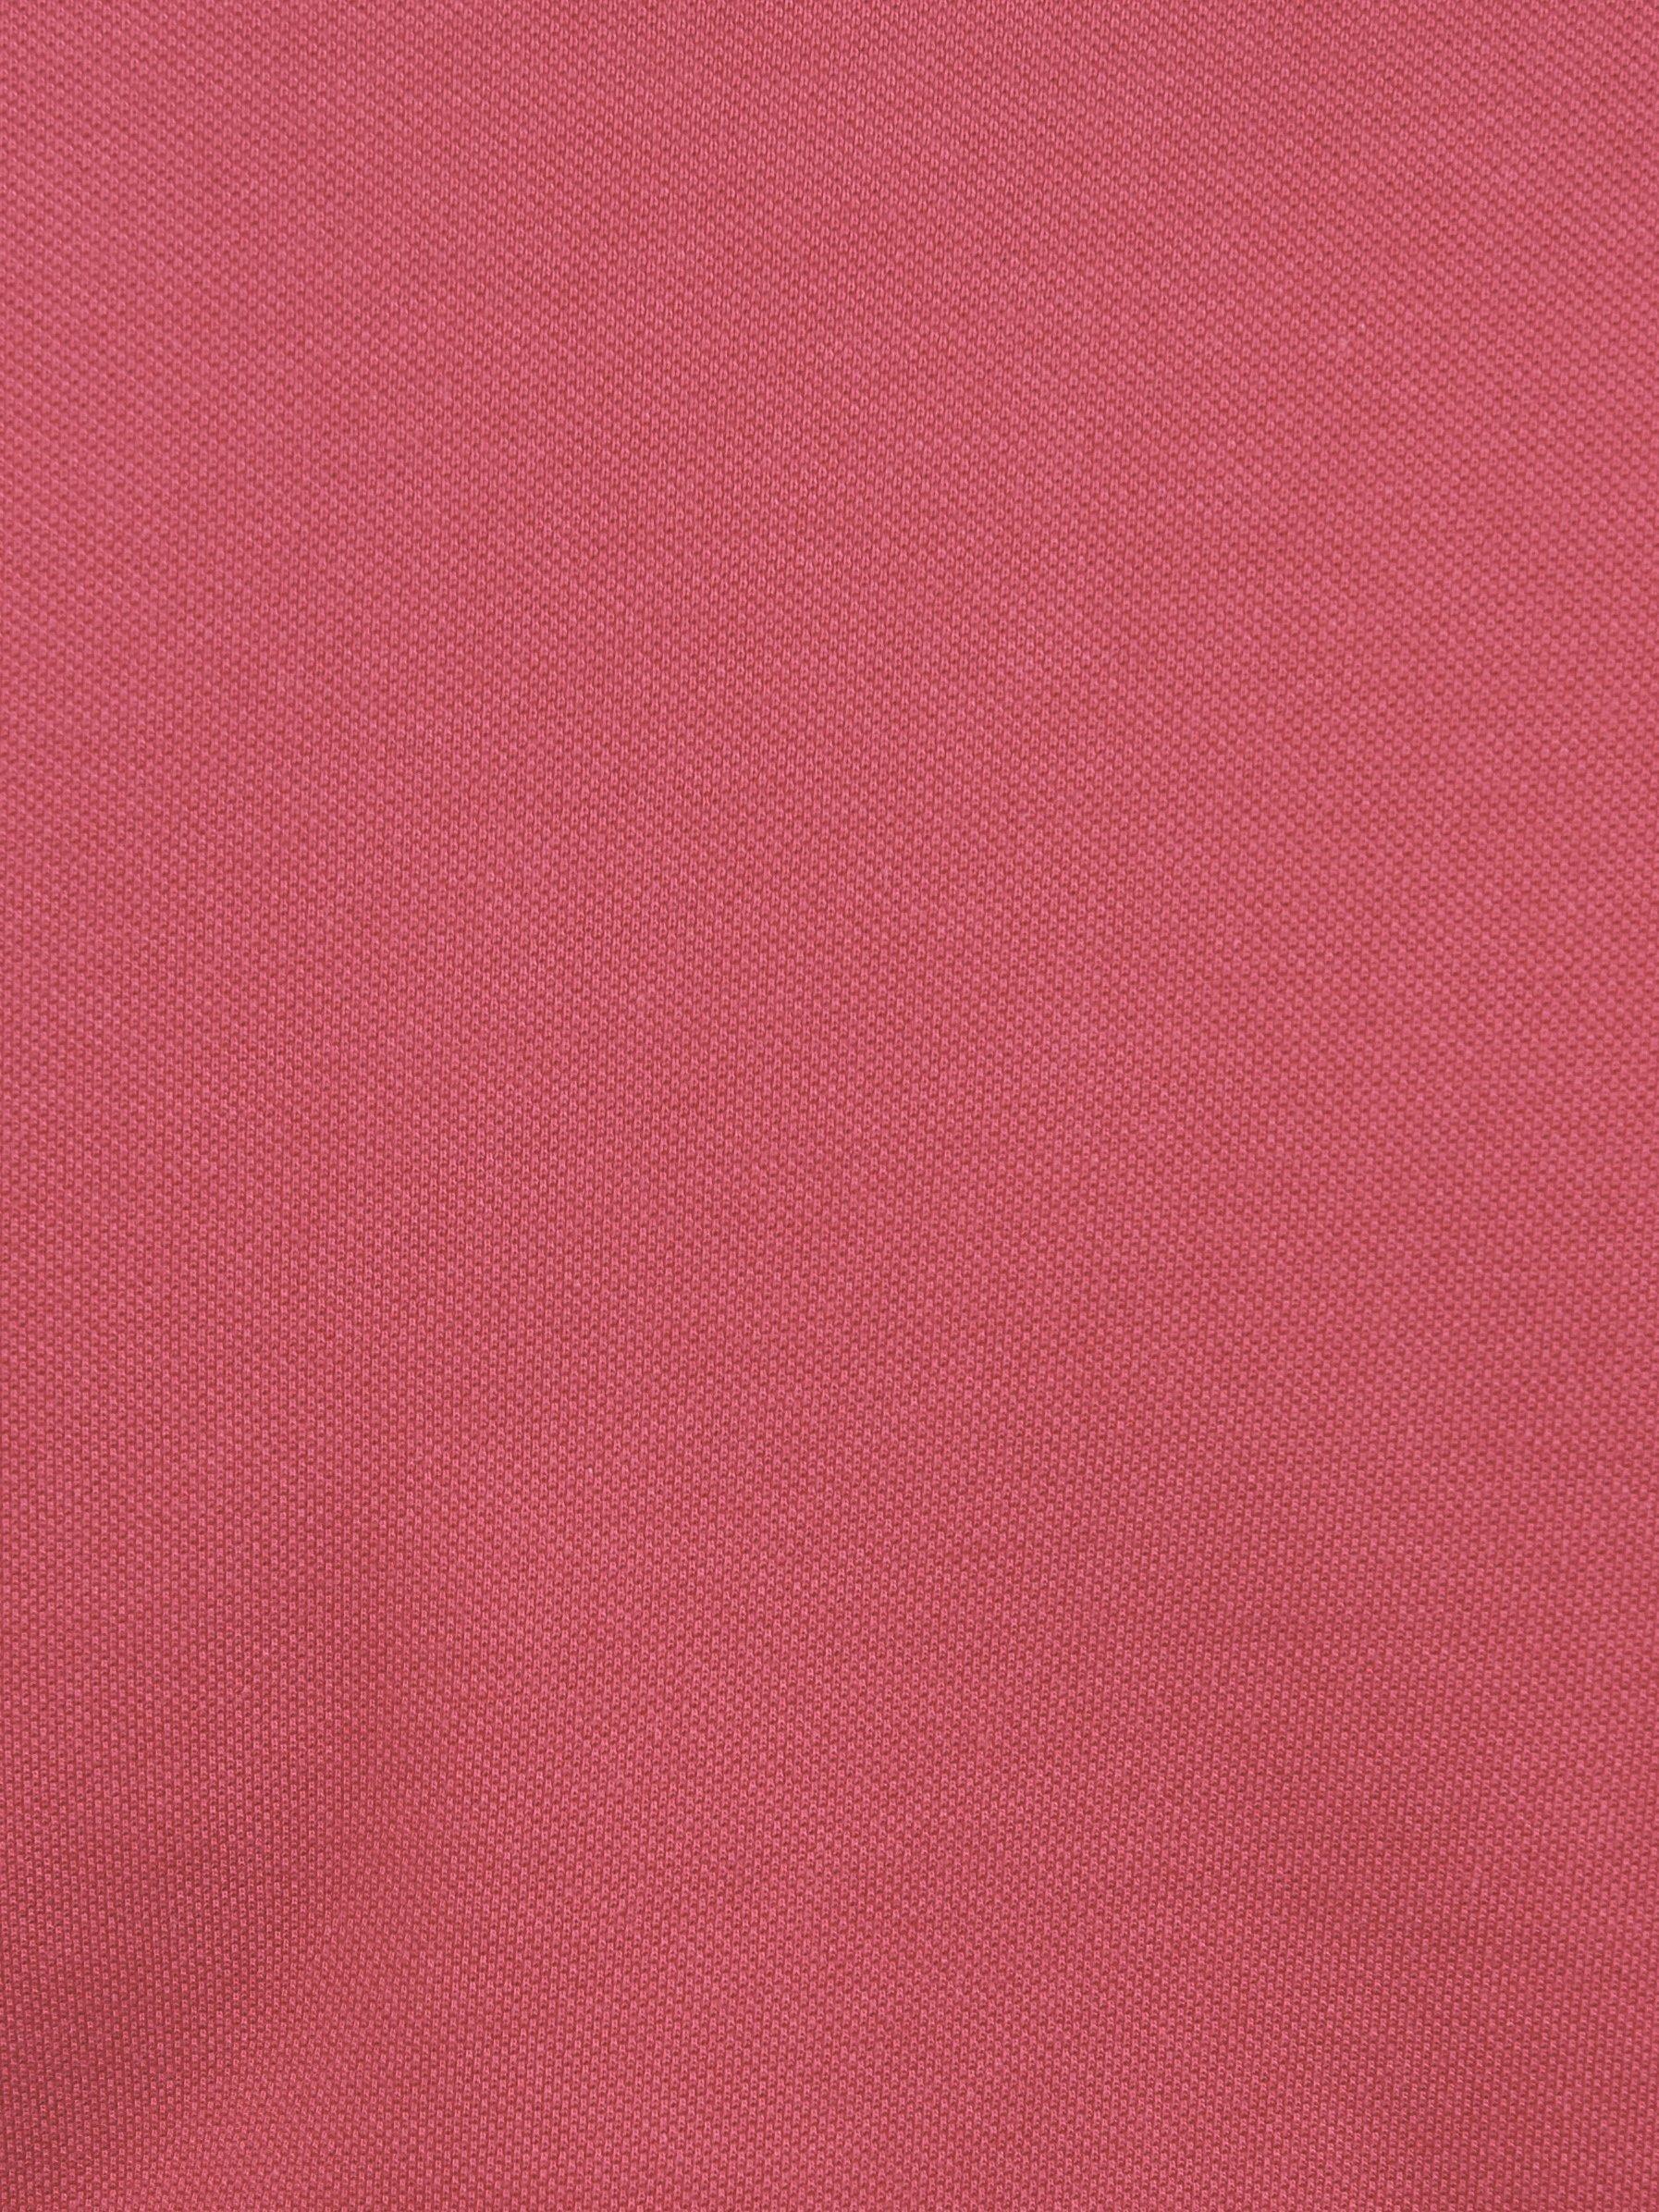 Polo MozartSolidFuschia Pink